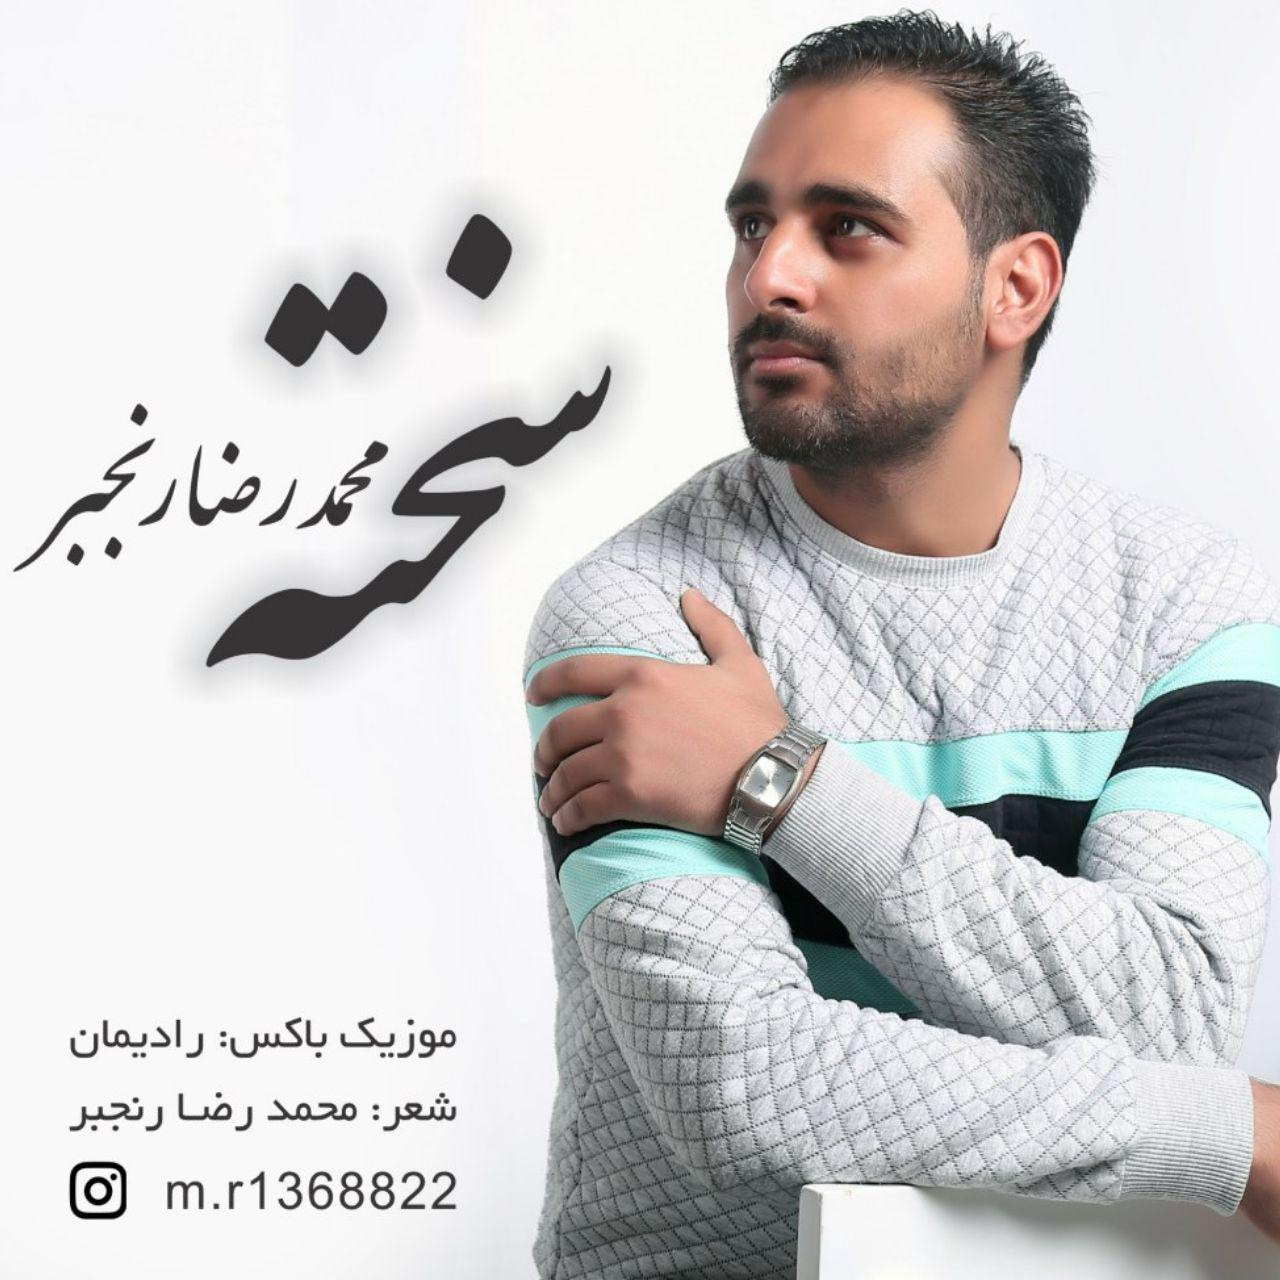 Mohammadreza Ranjbar - Sakhte Music | آهنگ محمدرضا رنجبر - سخته